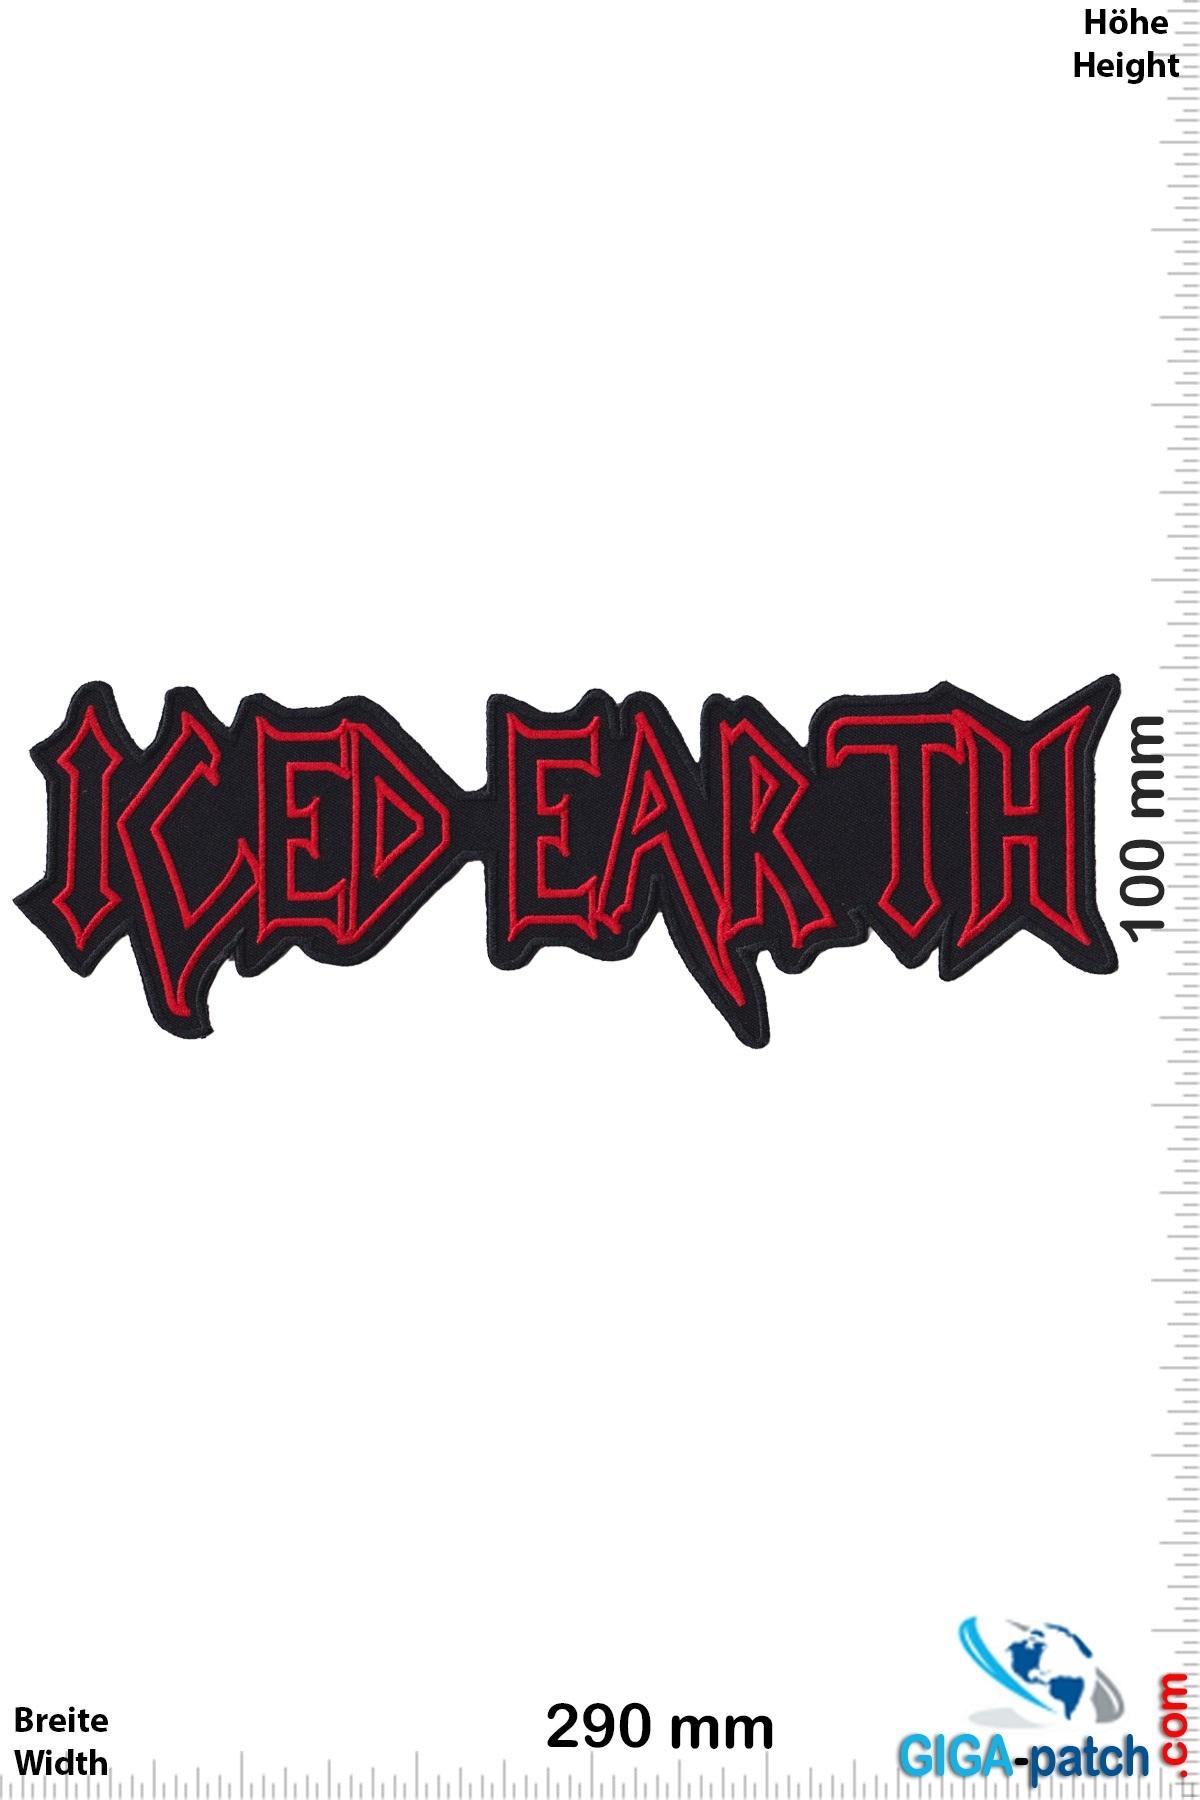 Iced Earth Iced Earth - Metal-Band -  29 cm - BIG